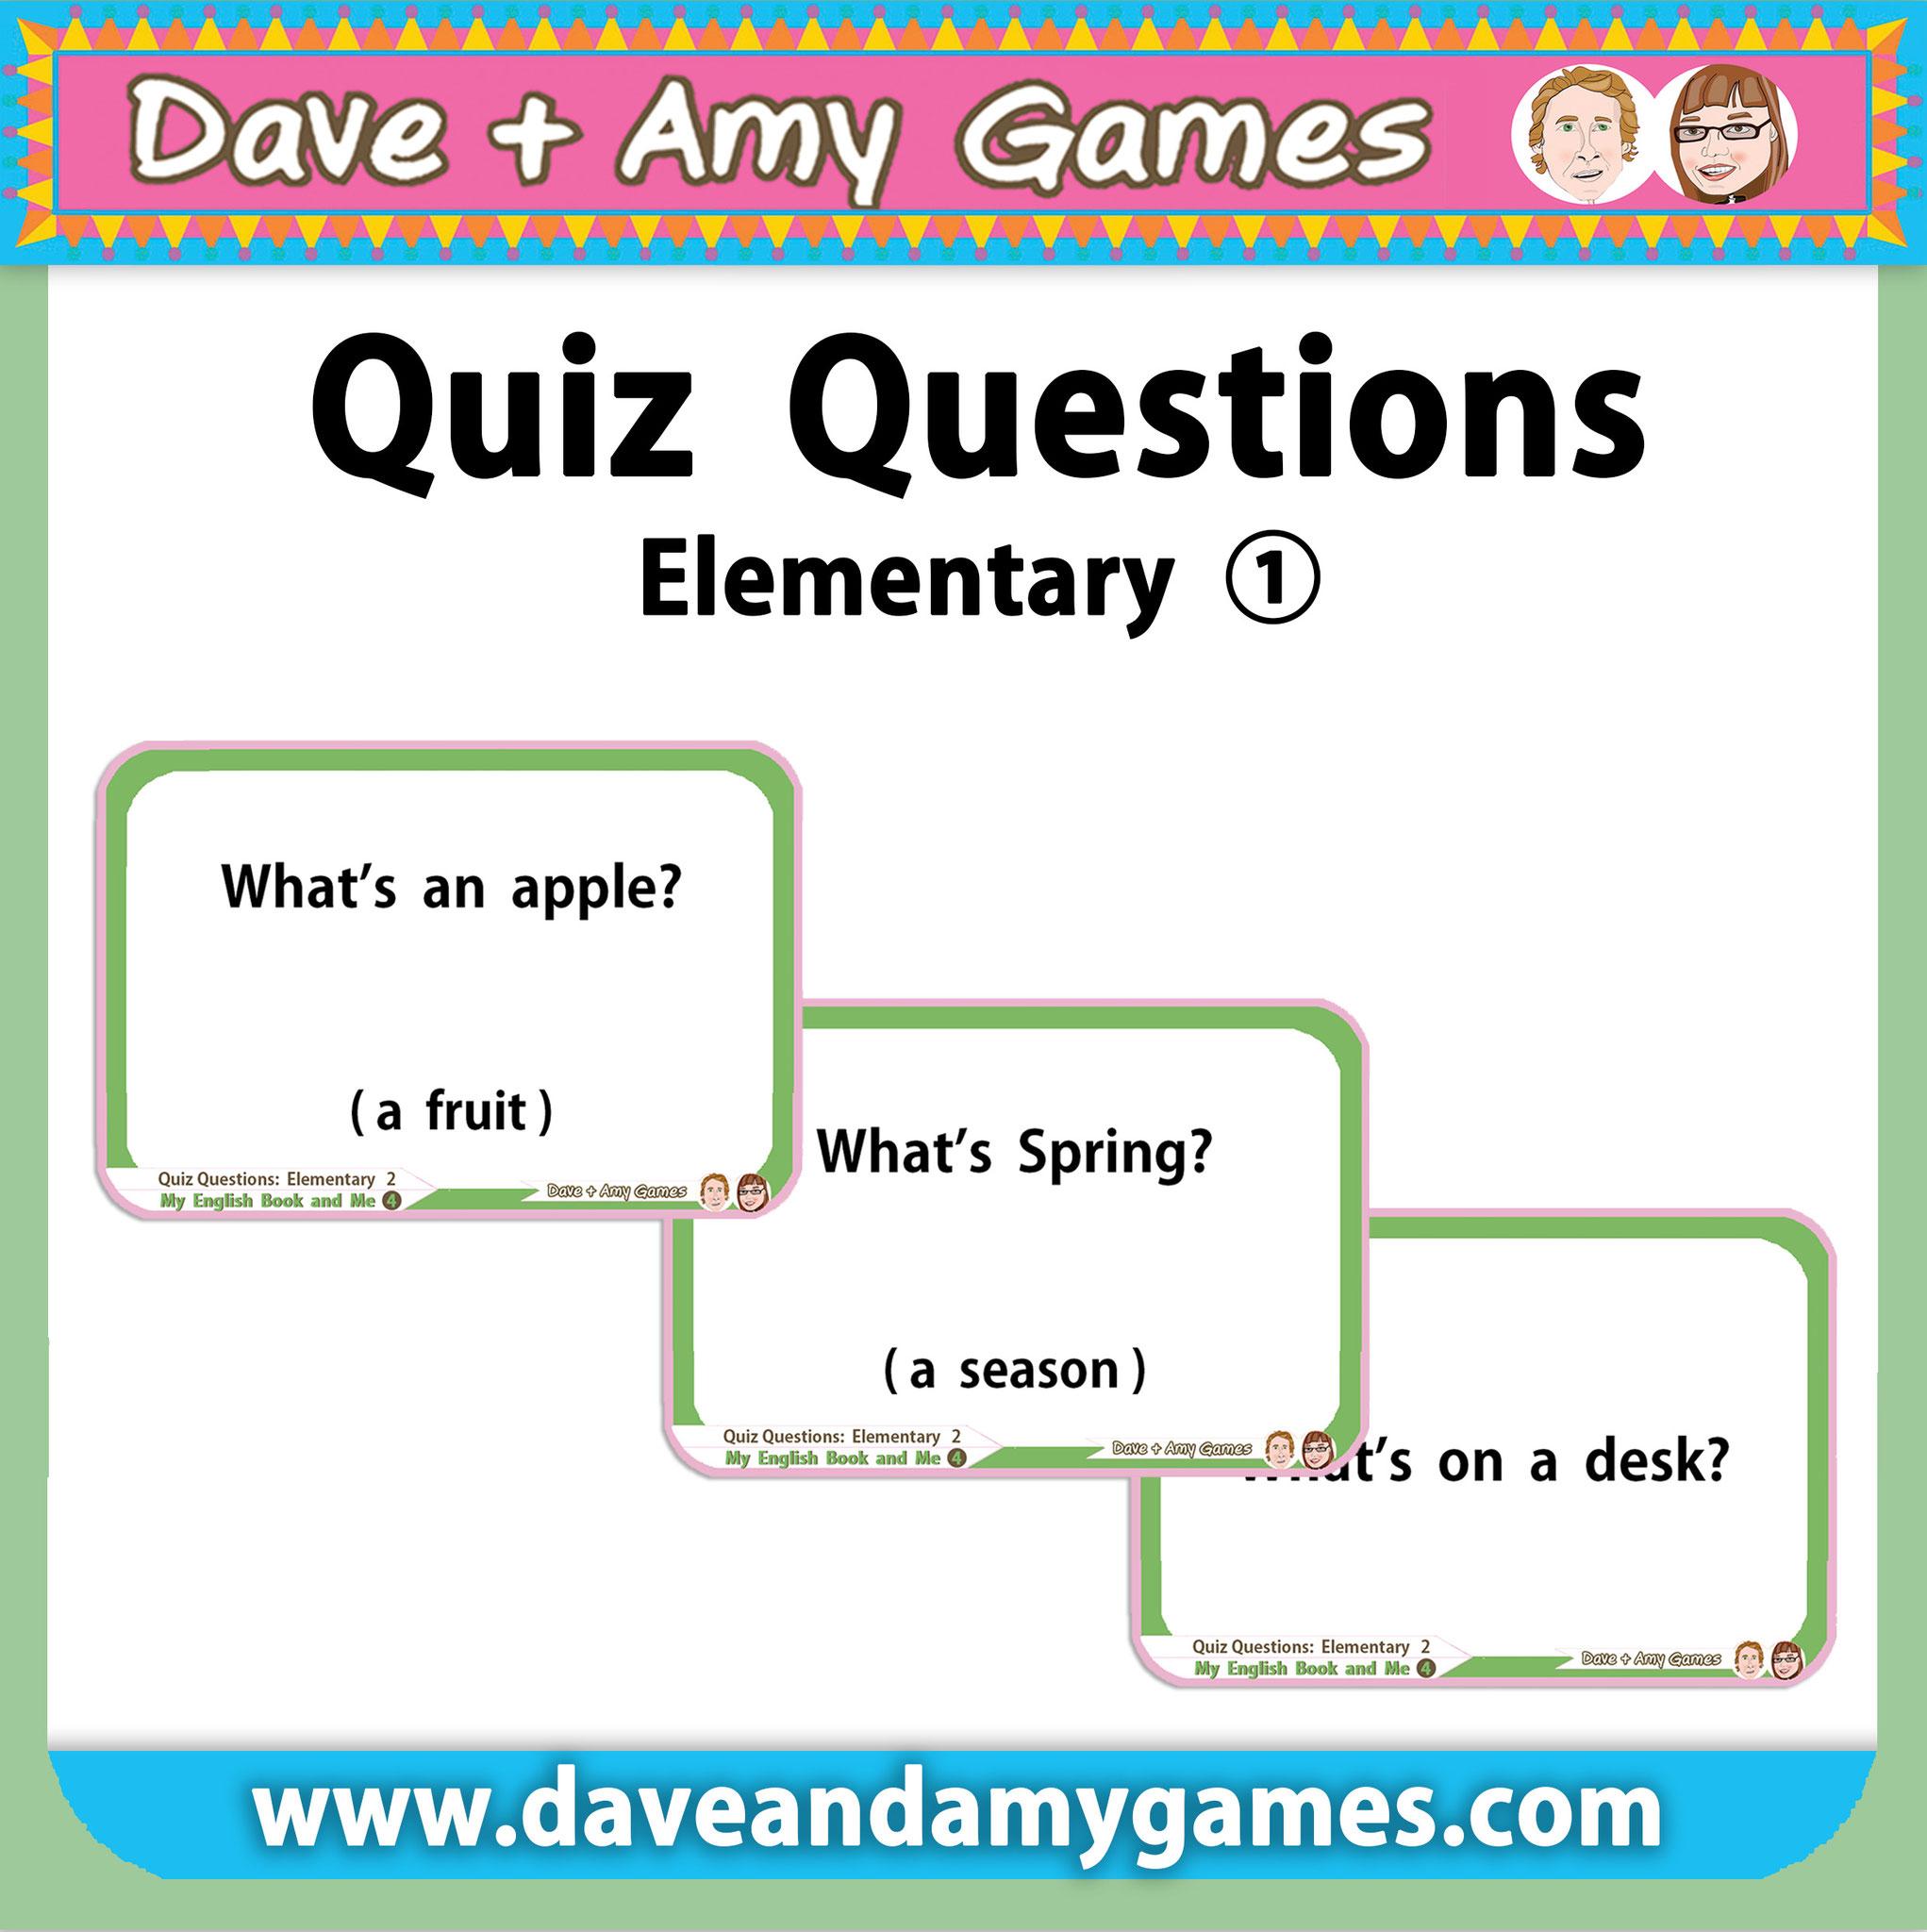 Quiz Questions (elementary quiz)